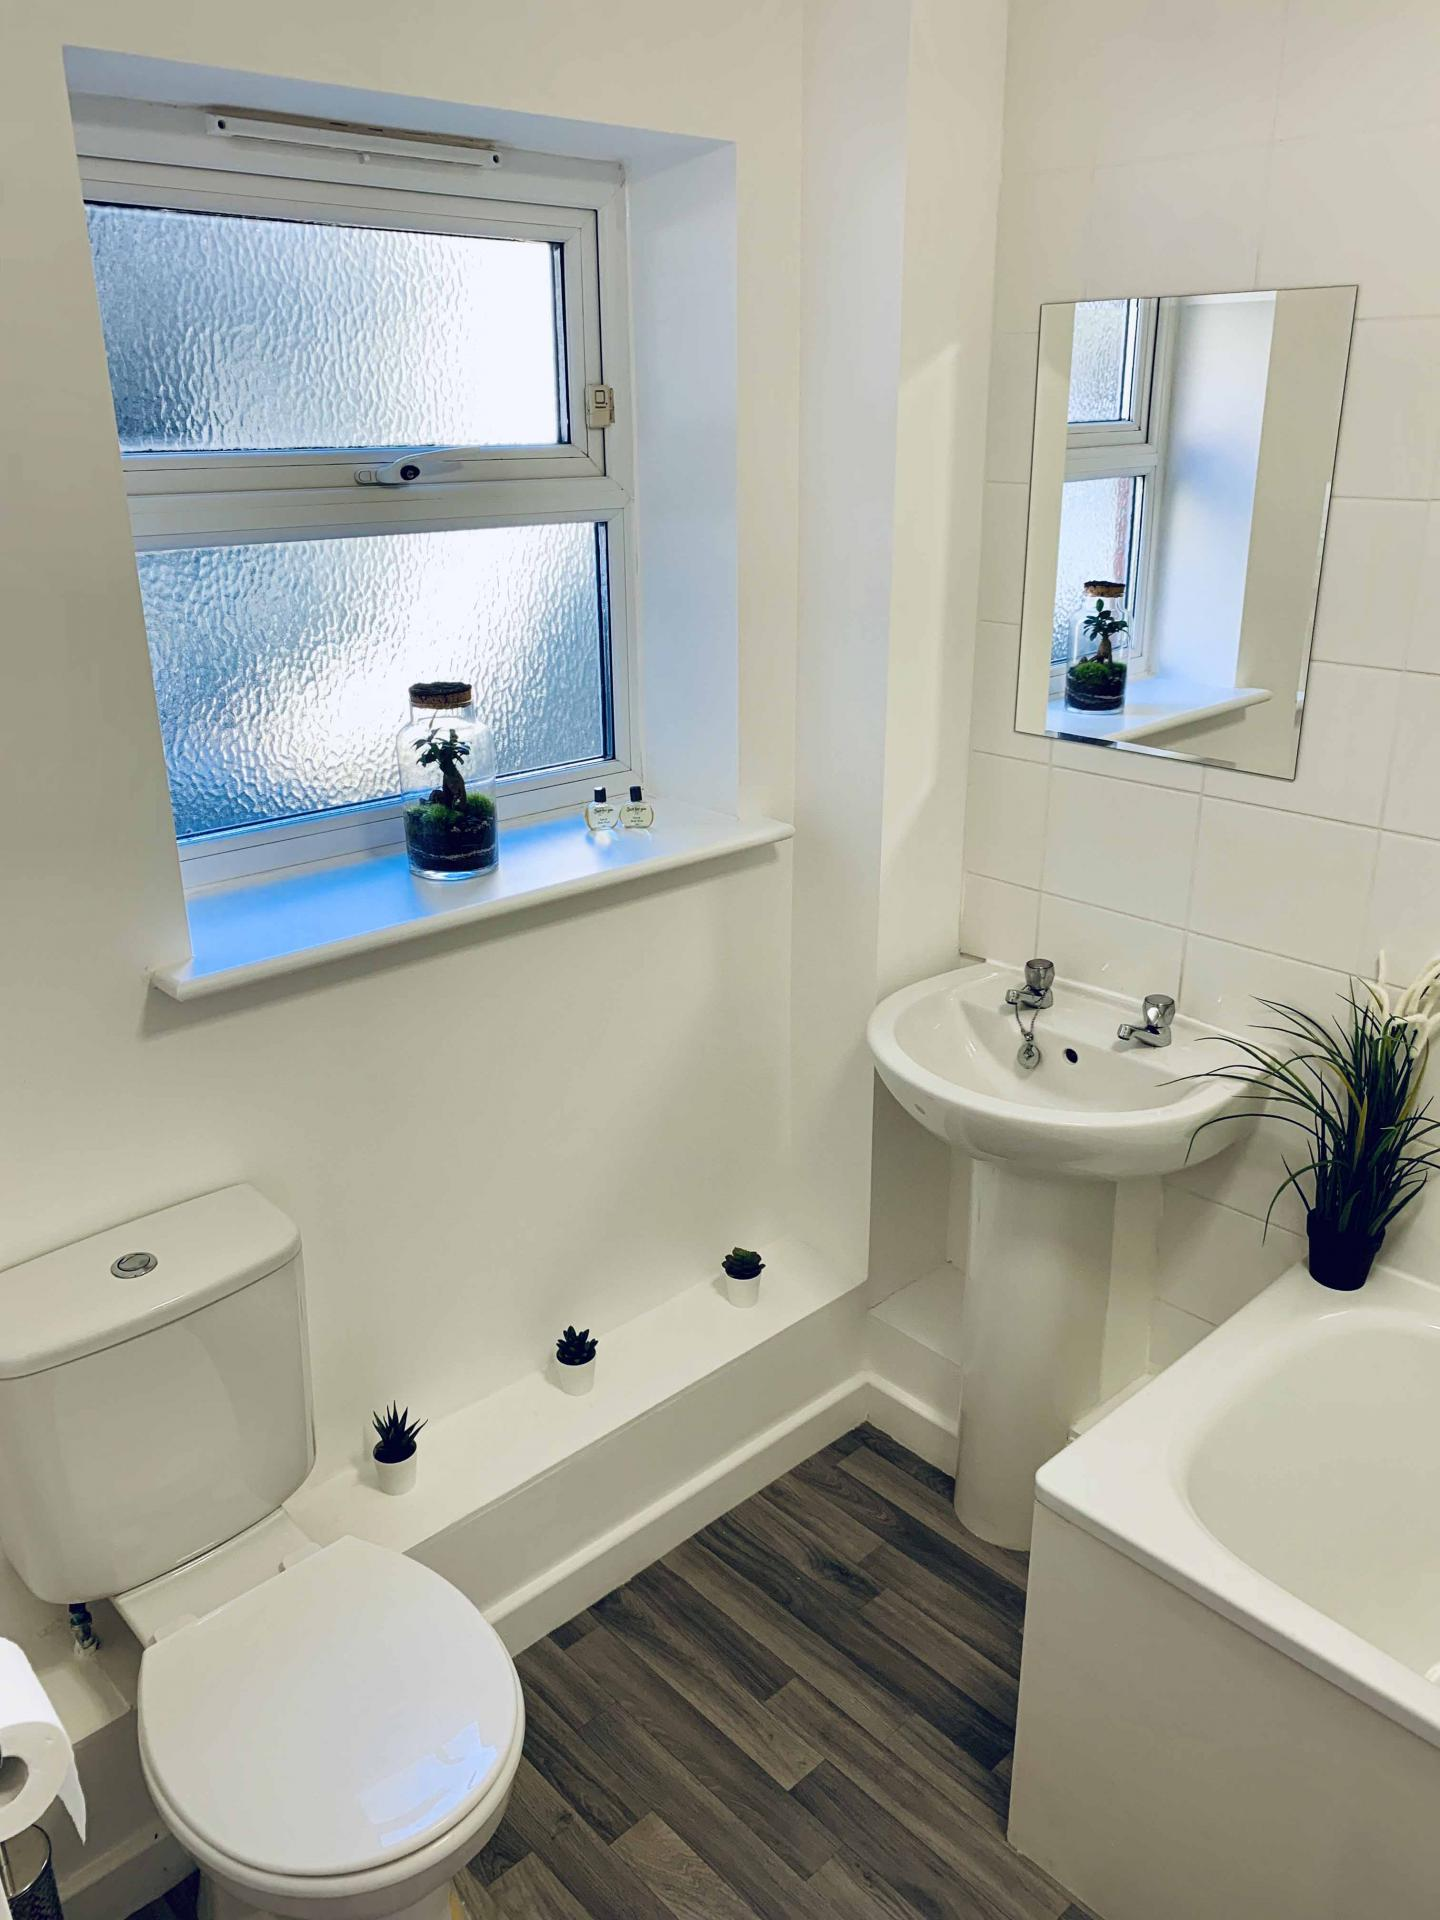 Sink at Barrack Road Apartment